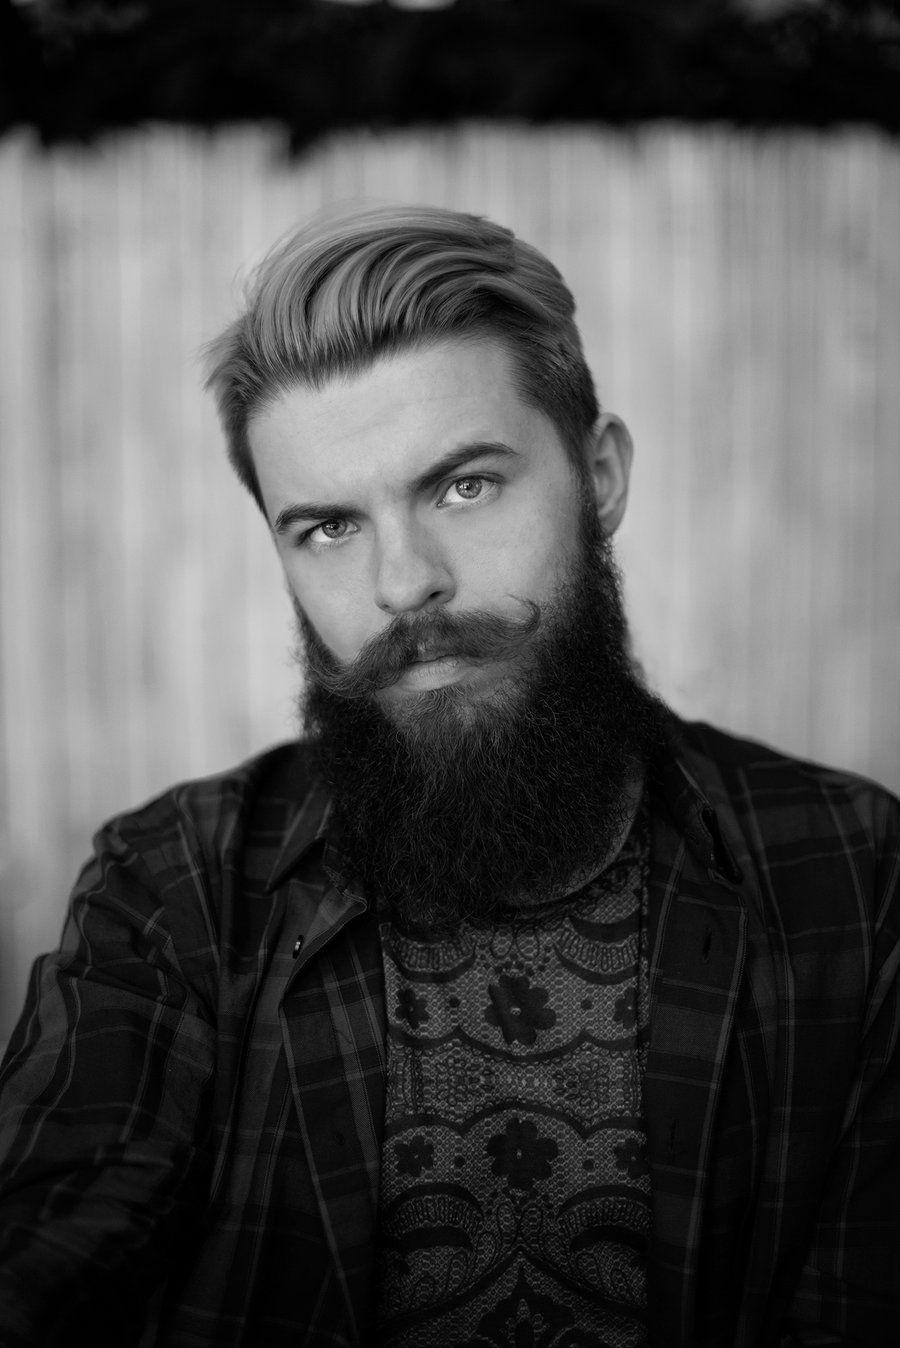 Serious Beard By Alex Esseker Beard No Mustache Beard Styles